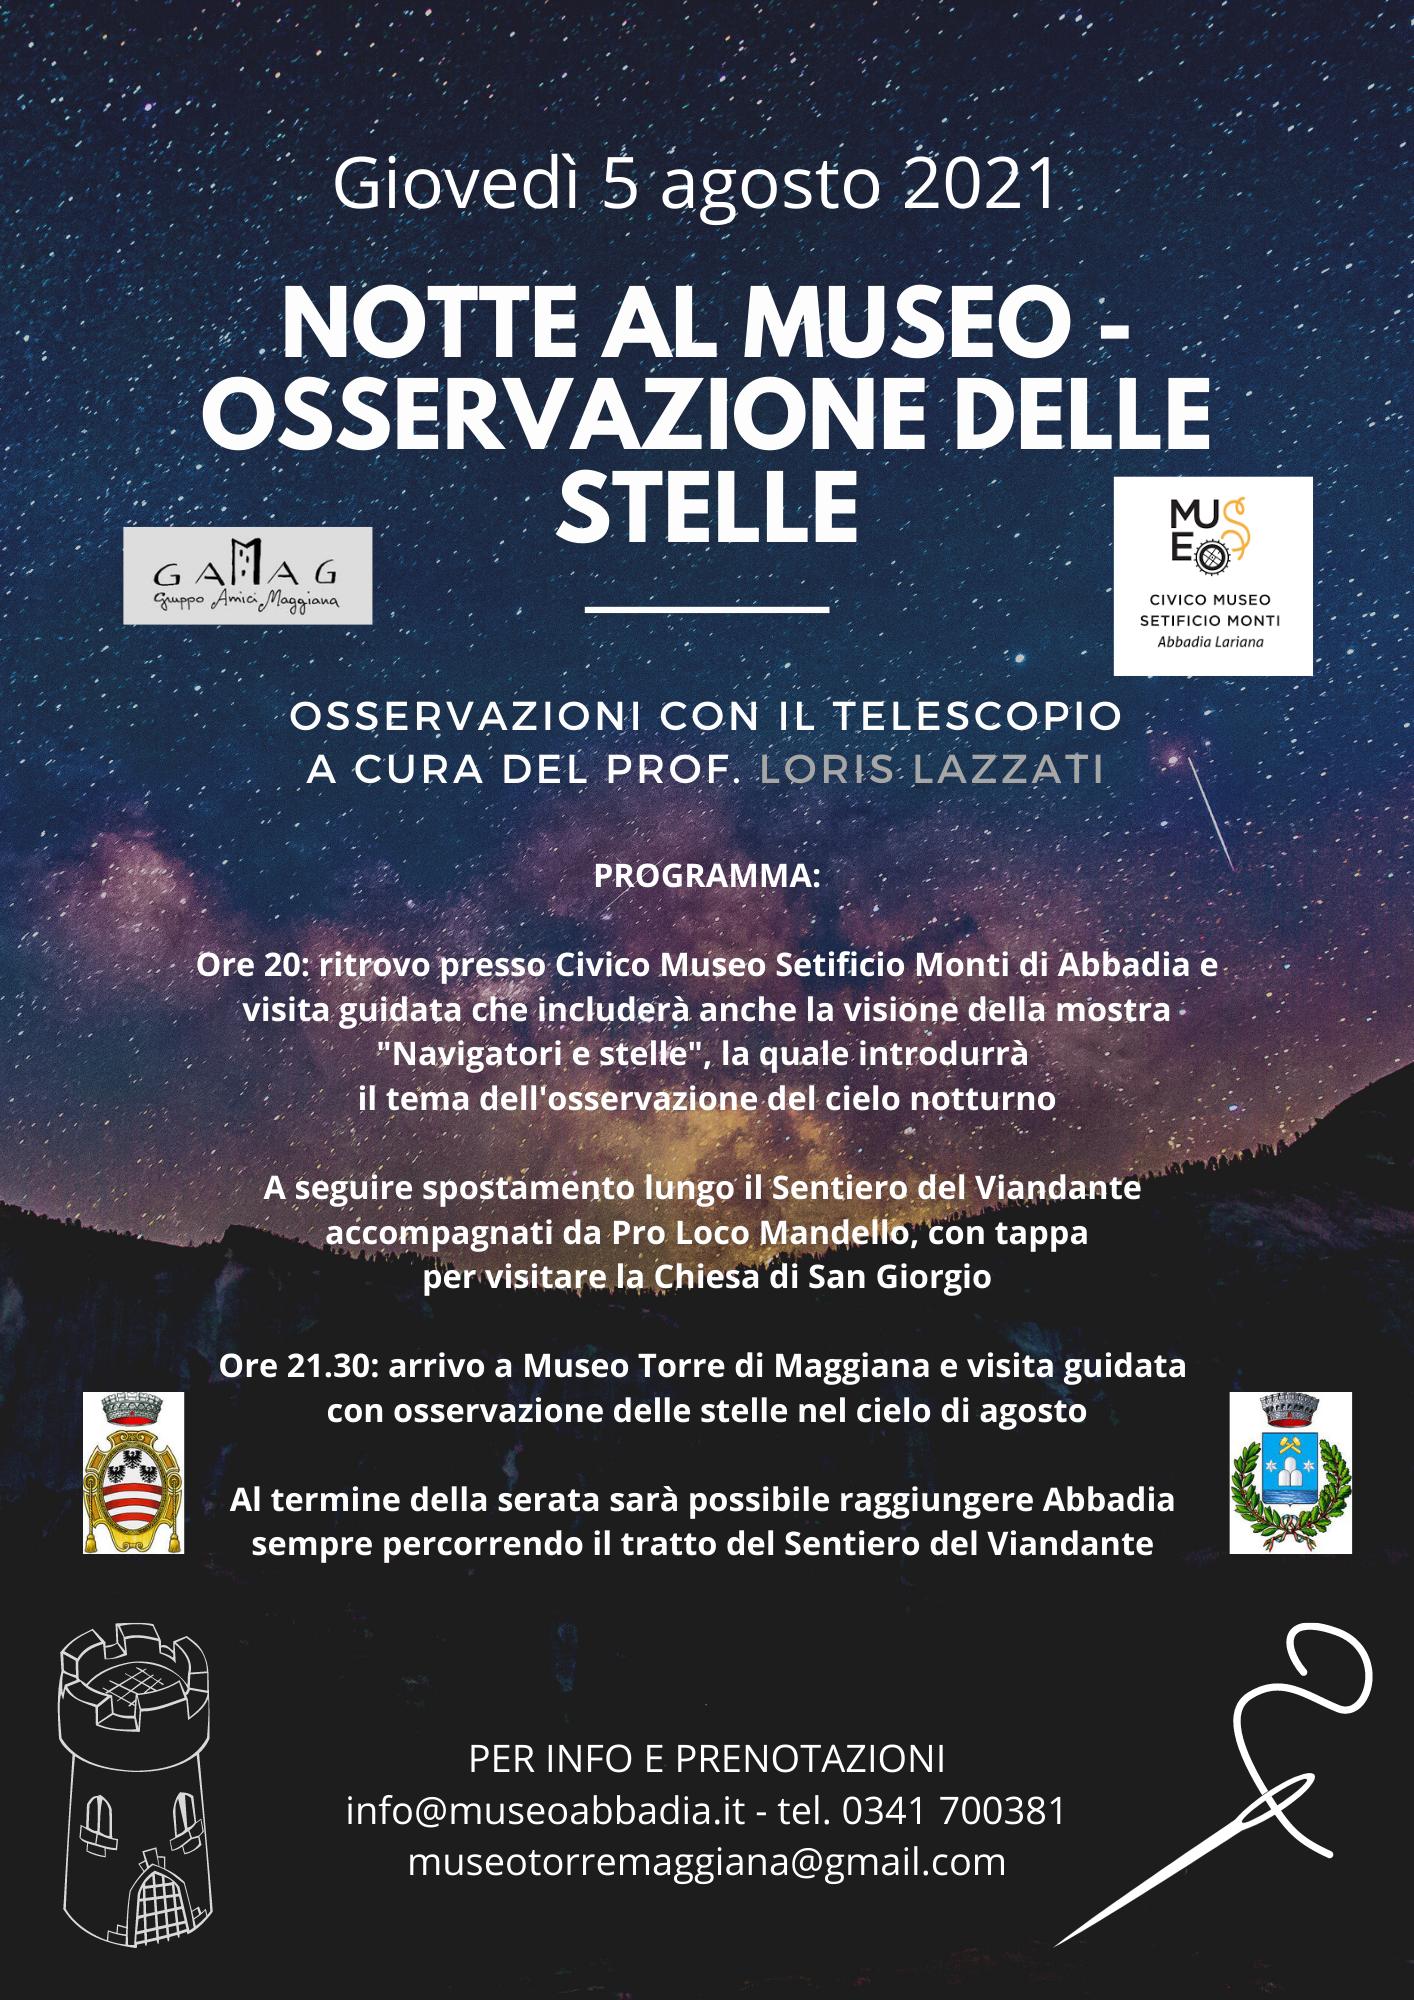 Locandina evento 5 agosto 2021